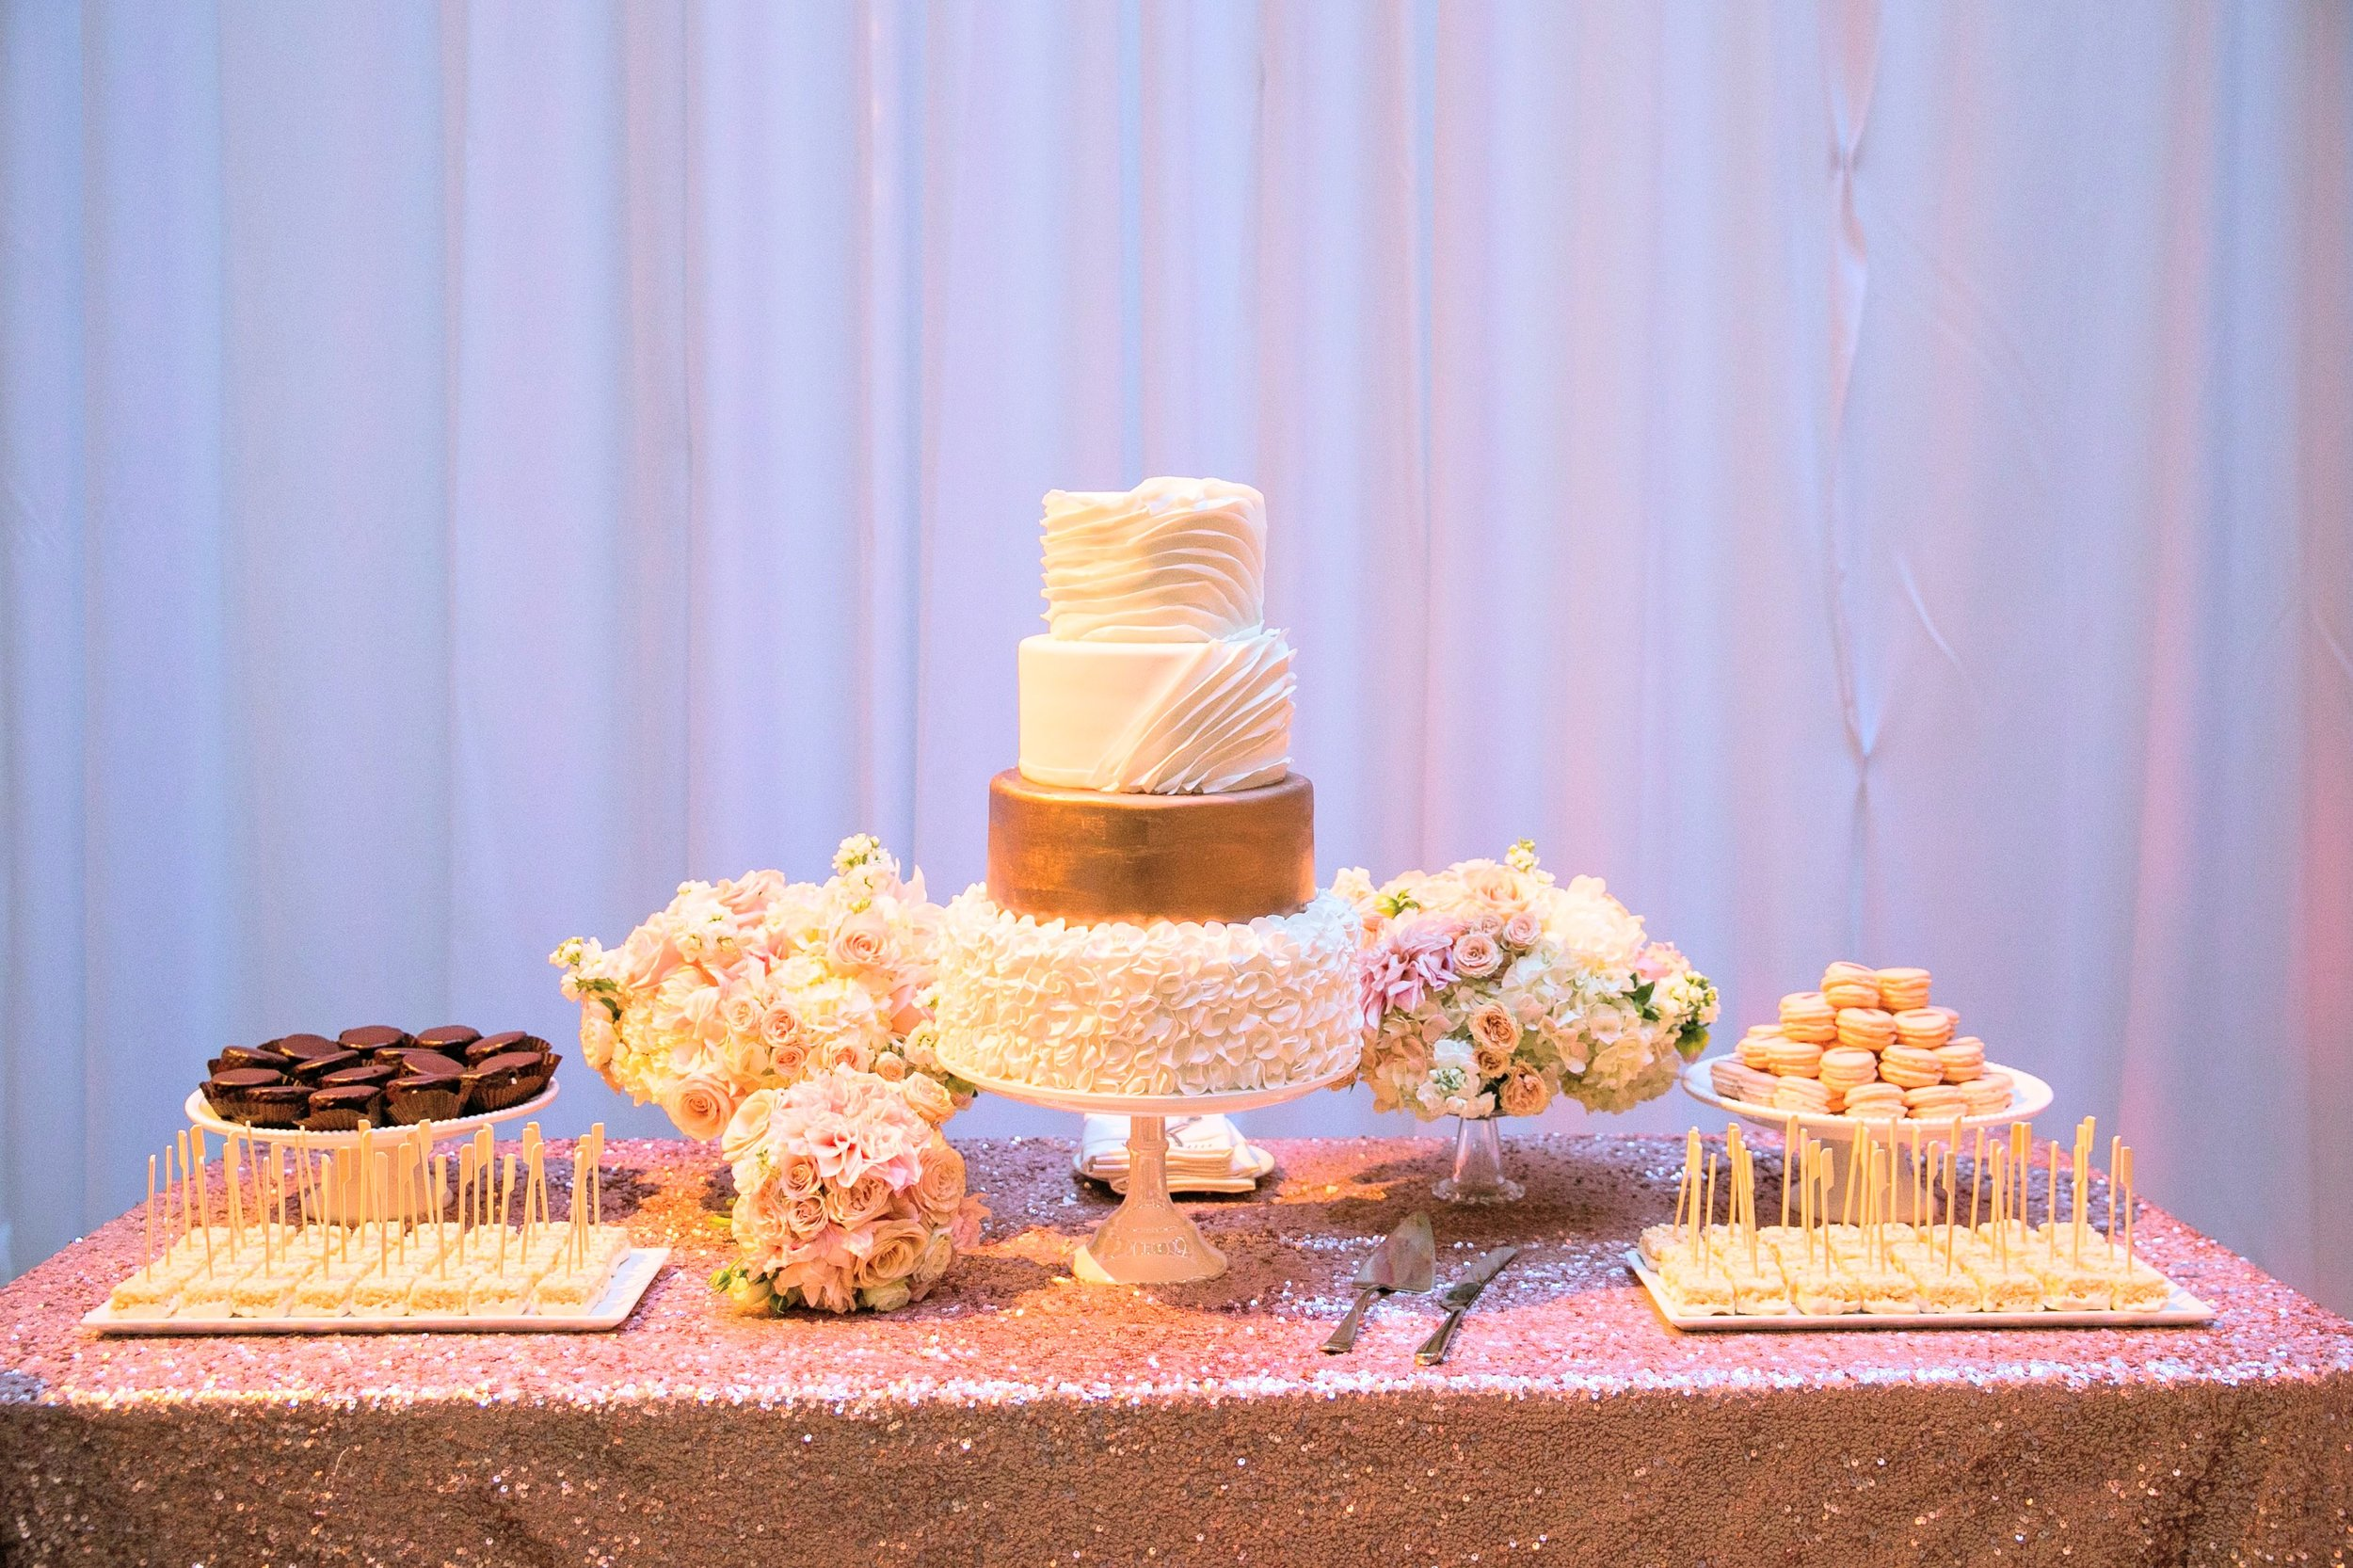 fondant-cakes04.jpg